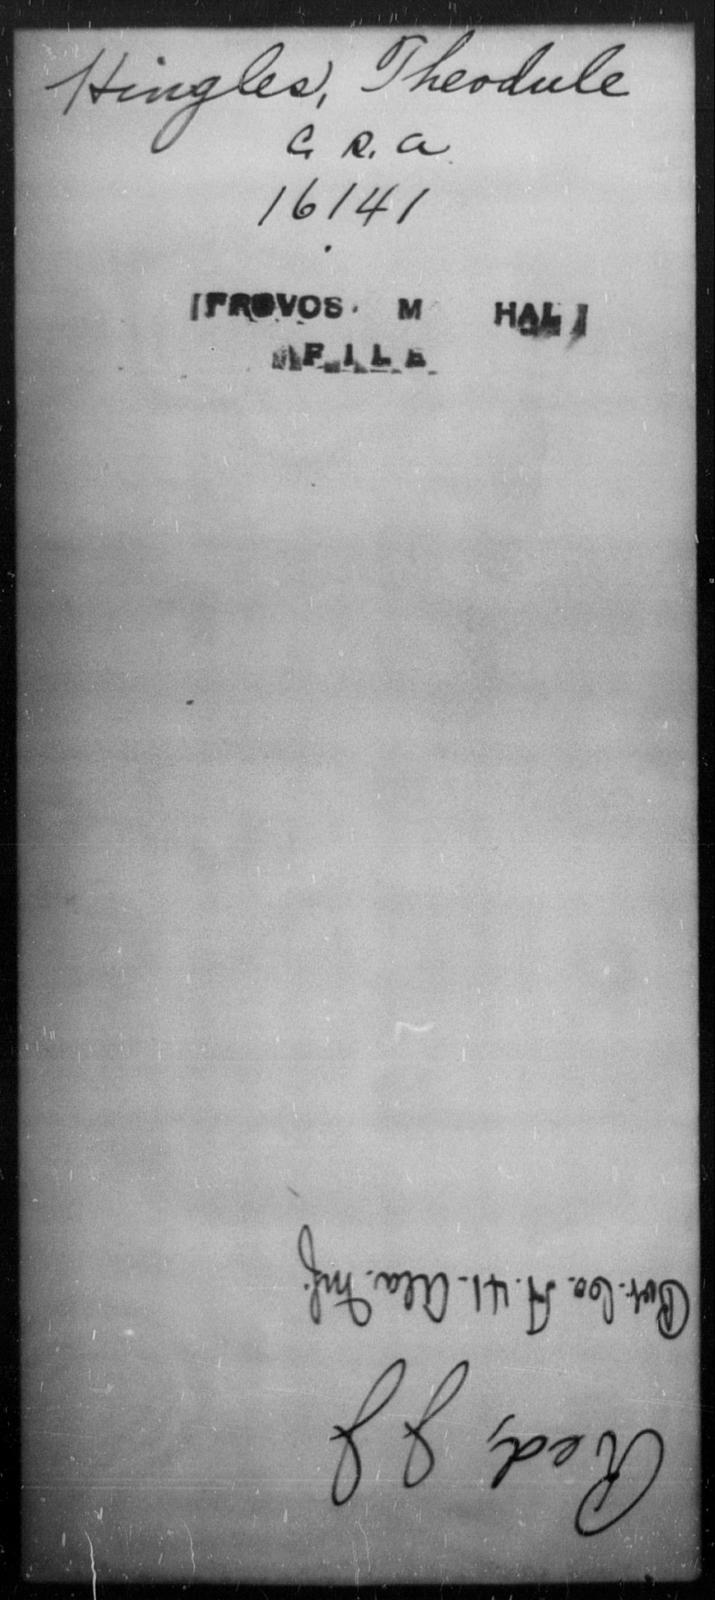 Hingles, Theodule - State: [Blank] - Year: [Blank]